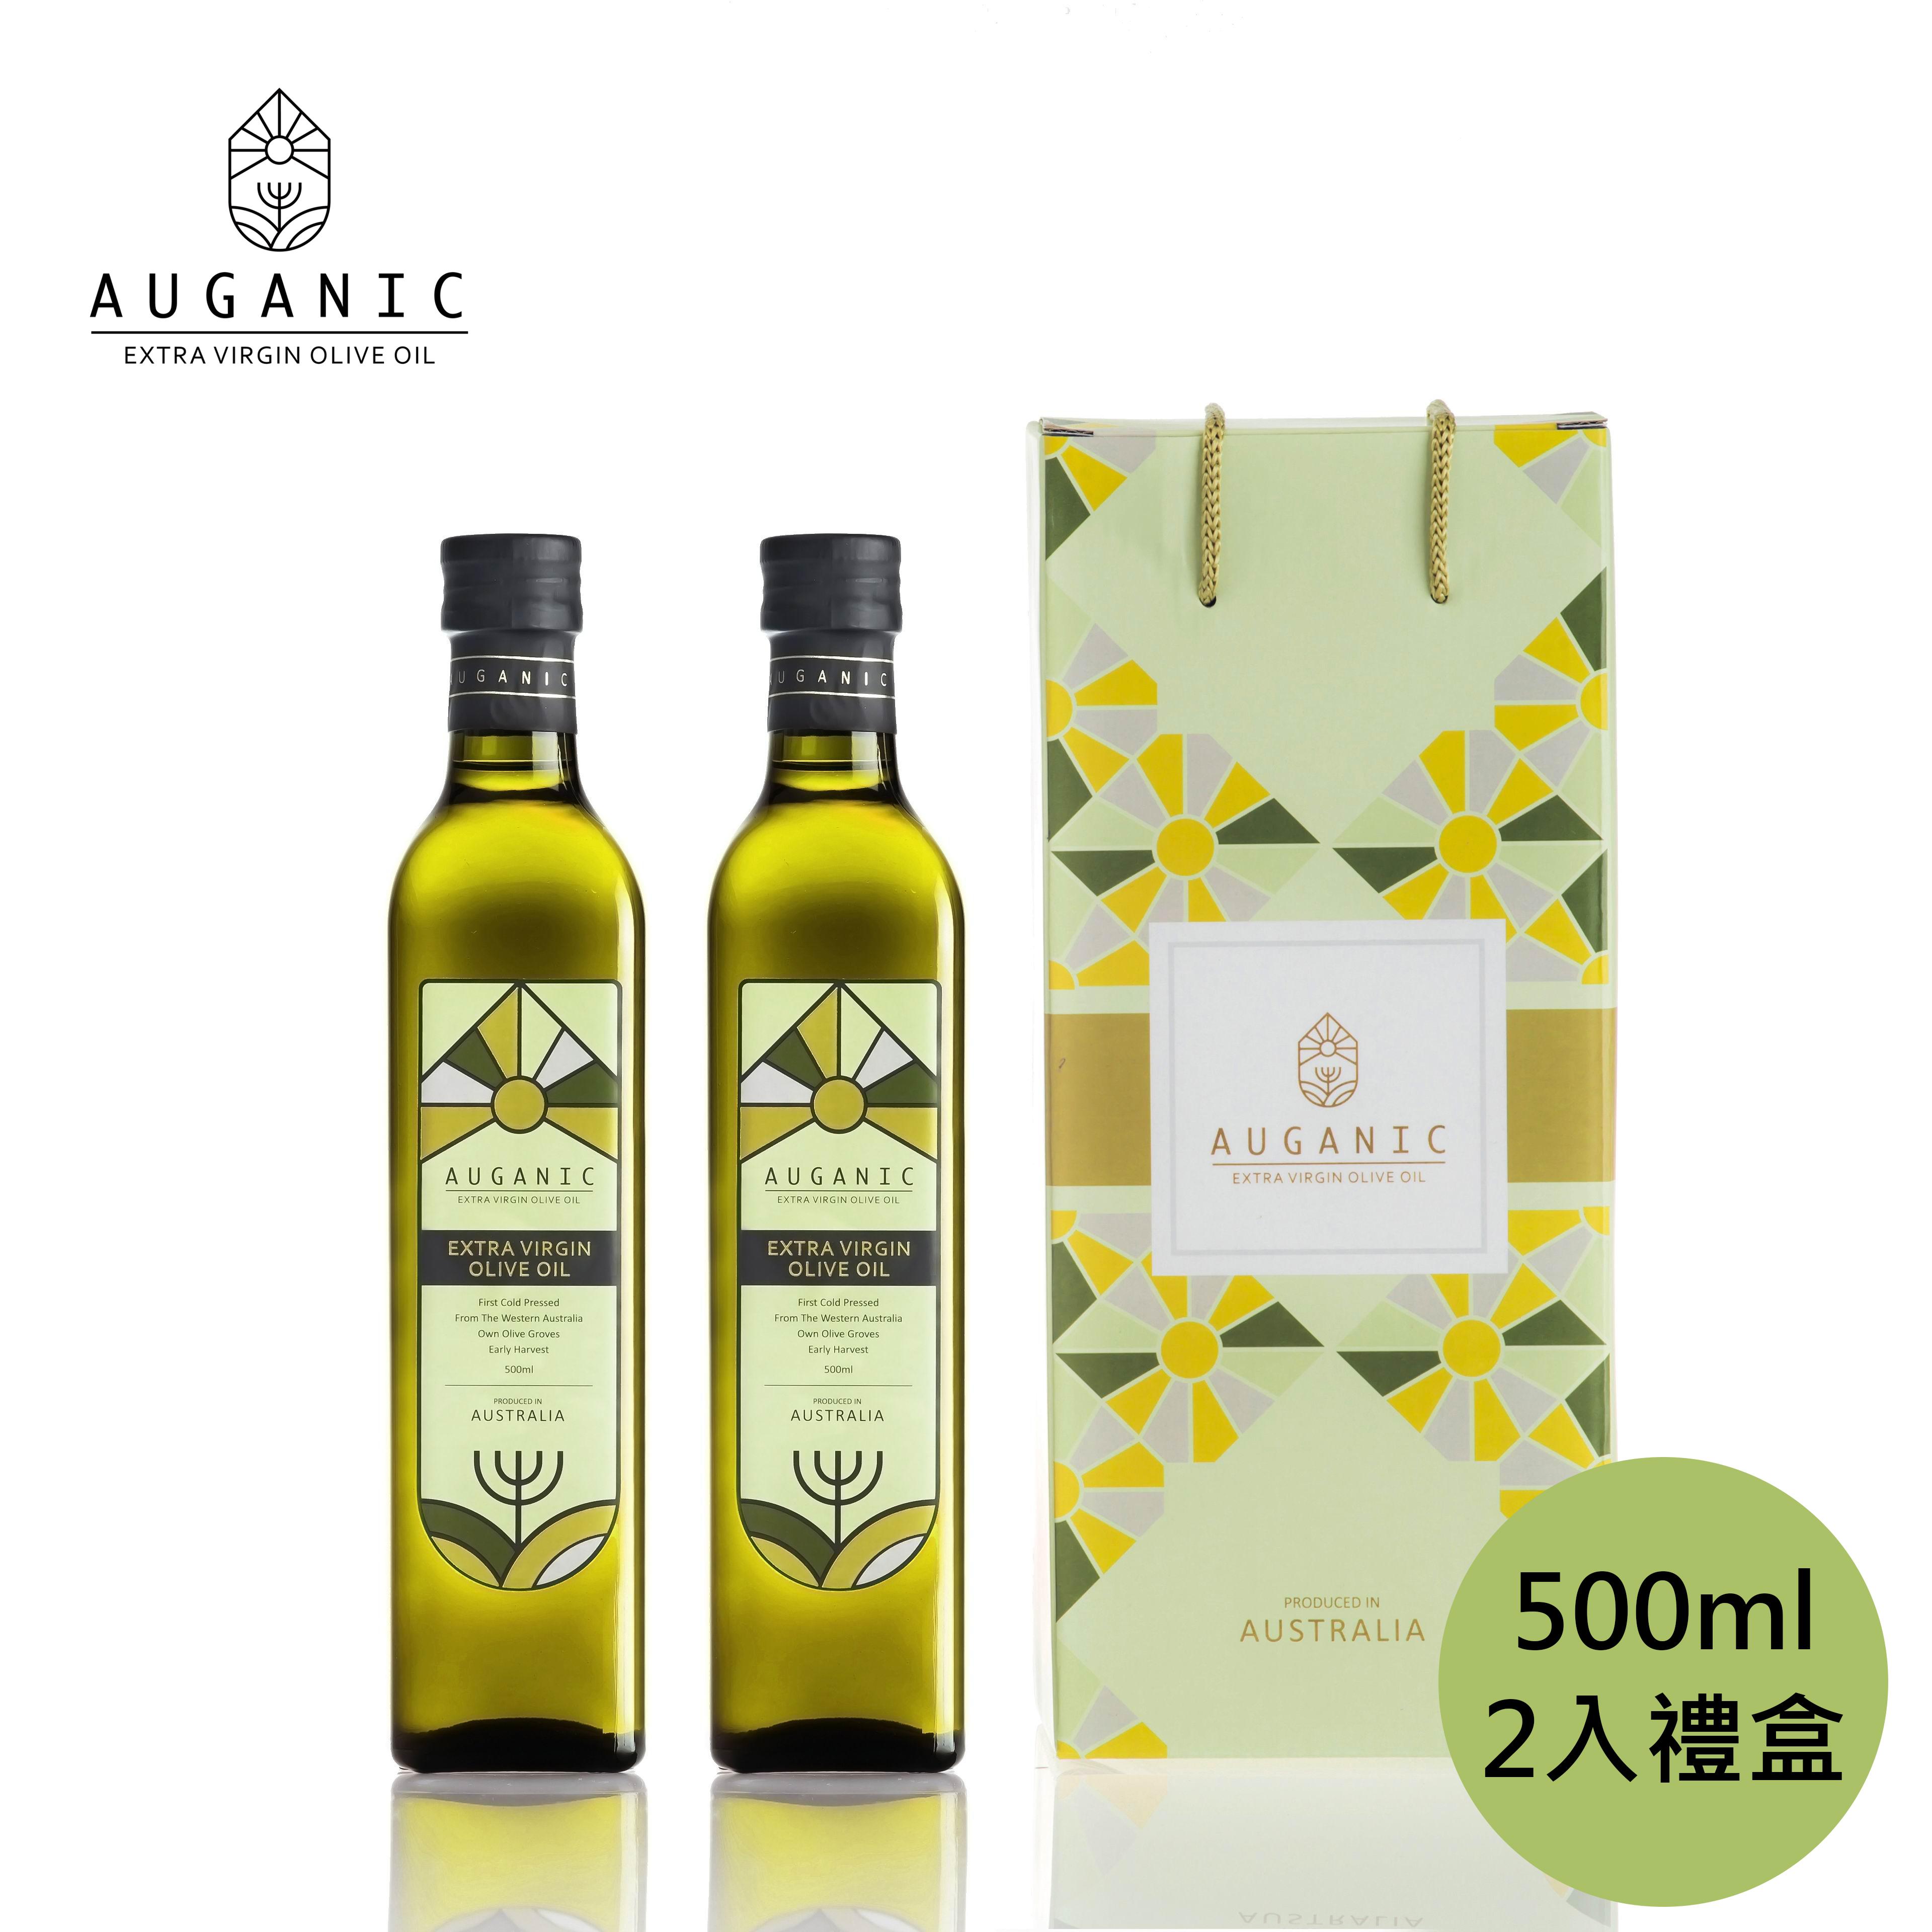 ~AUGANIC 澳根尼~澳洲 特級冷壓初榨橄欖油 500ml 2入組